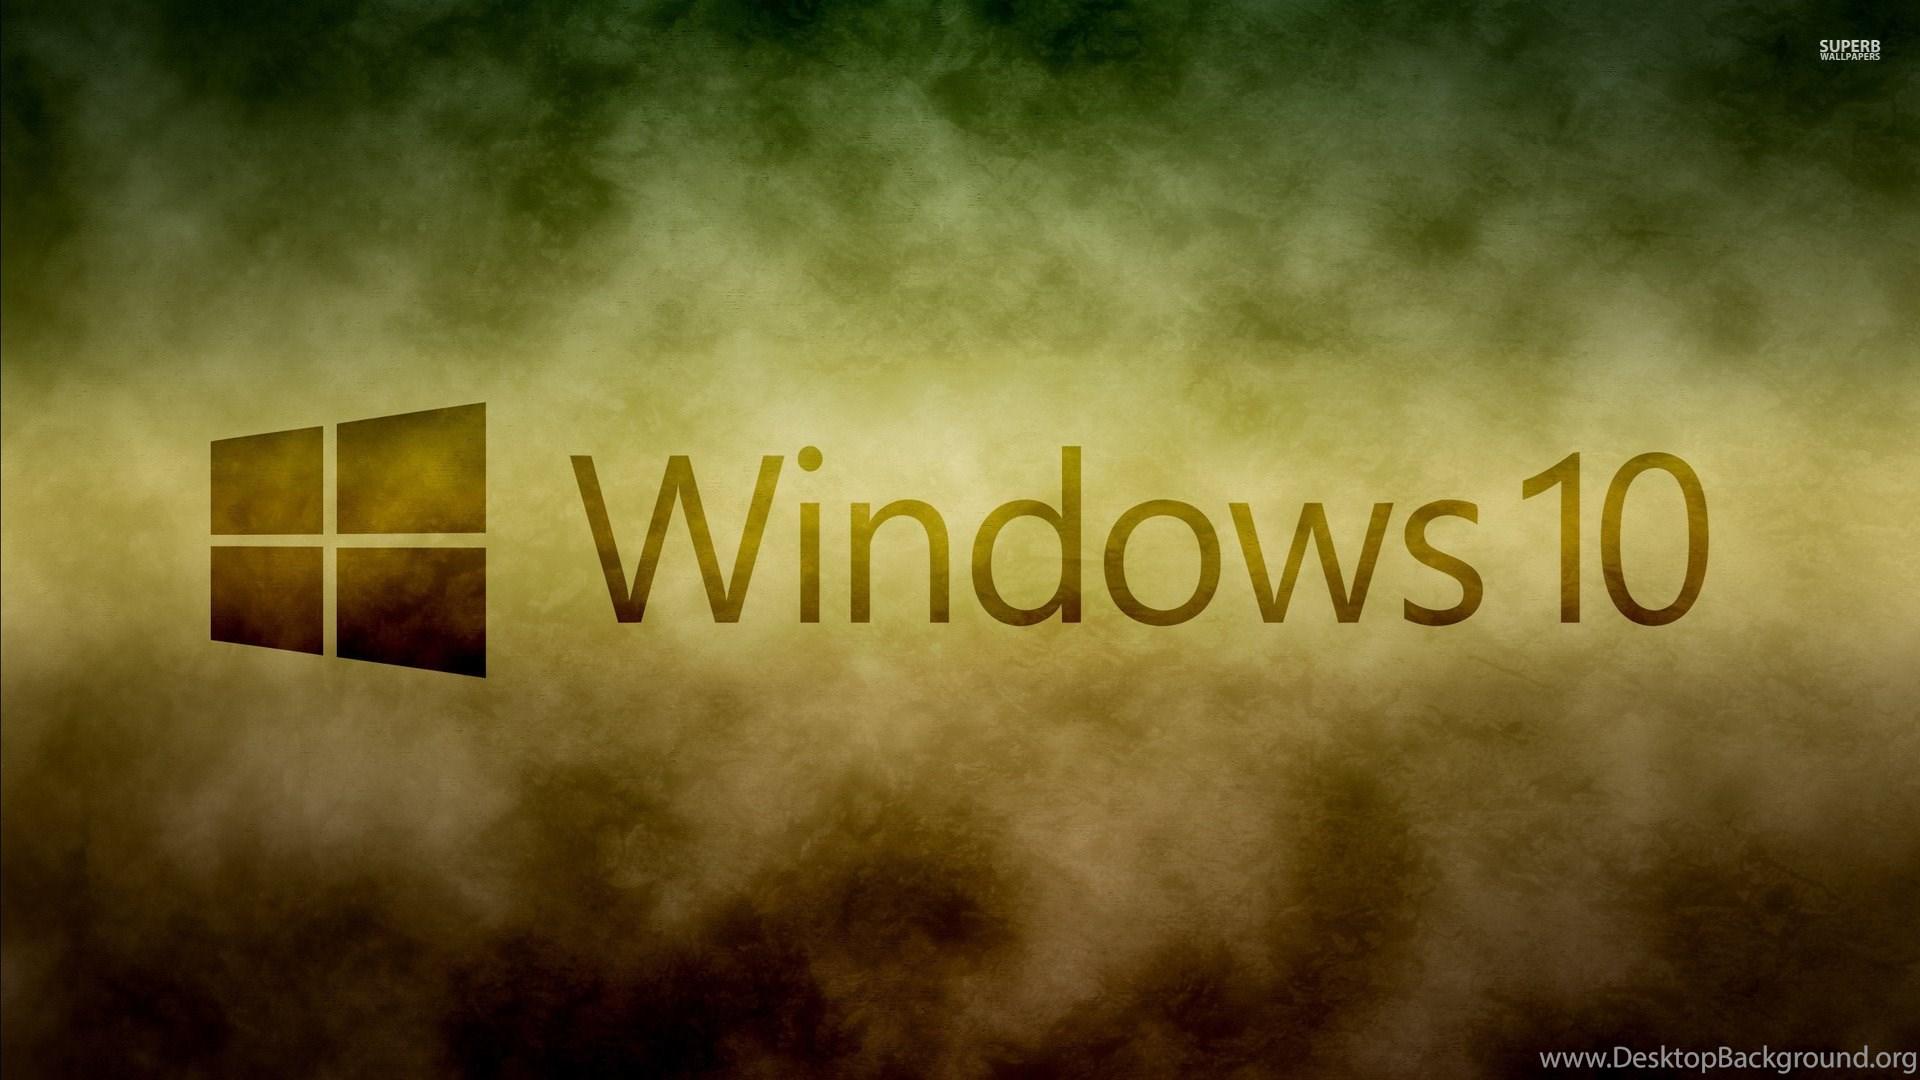 Wallpapers Windows 10 Hd Cutewallpaper Org Desktop Background